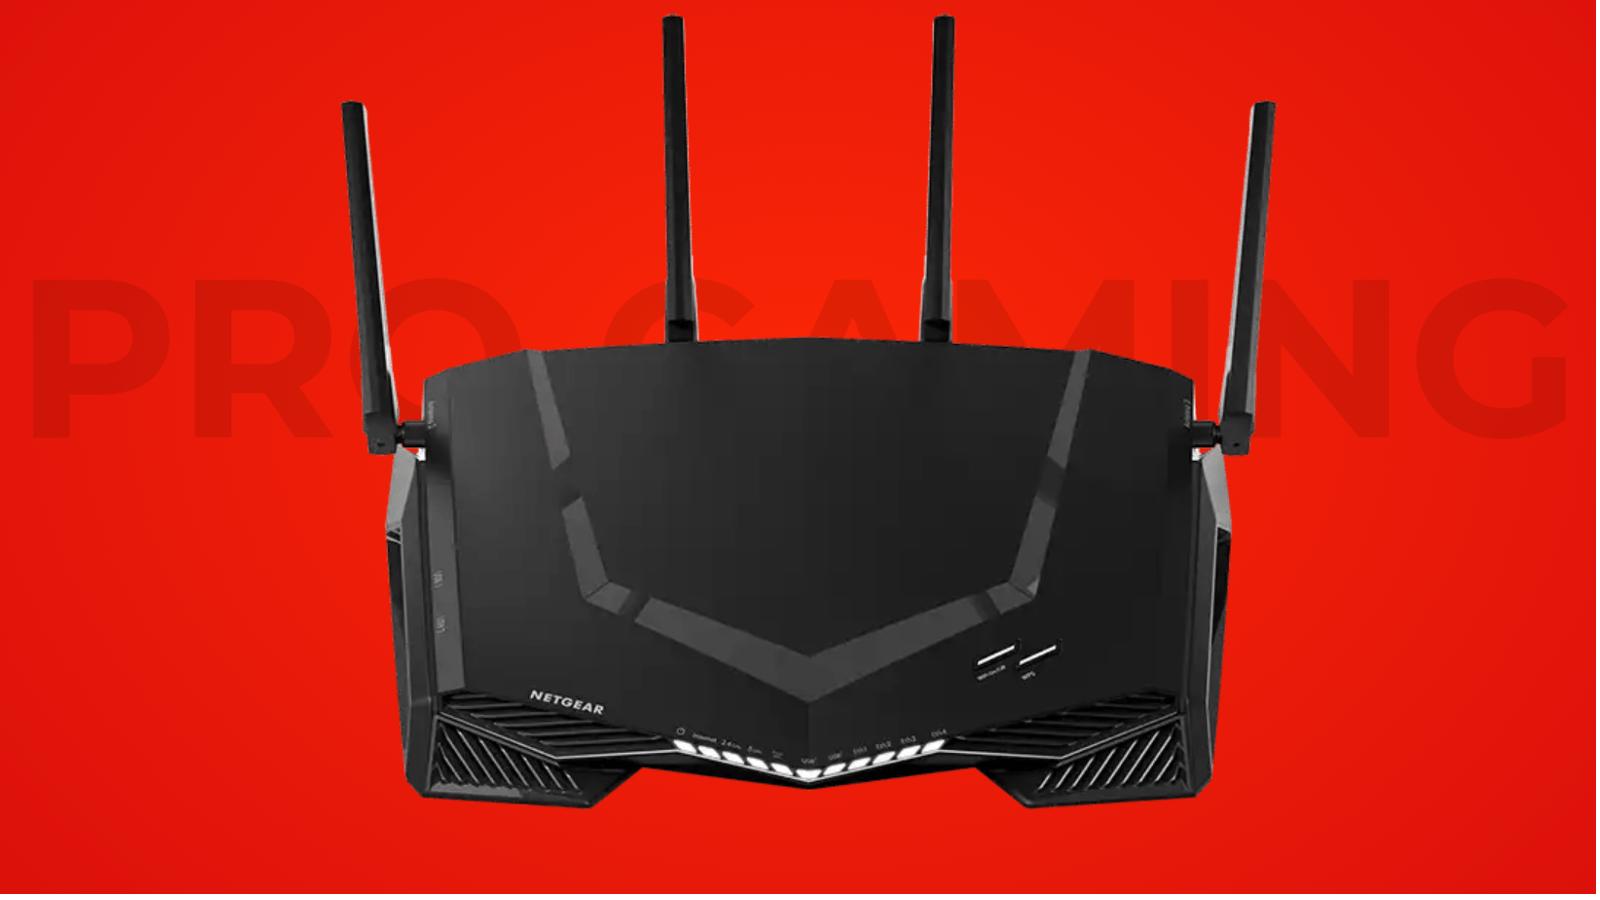 netgear-nighthawk-pro-xr500-linksys-wrt32x-gaming-router-comparison